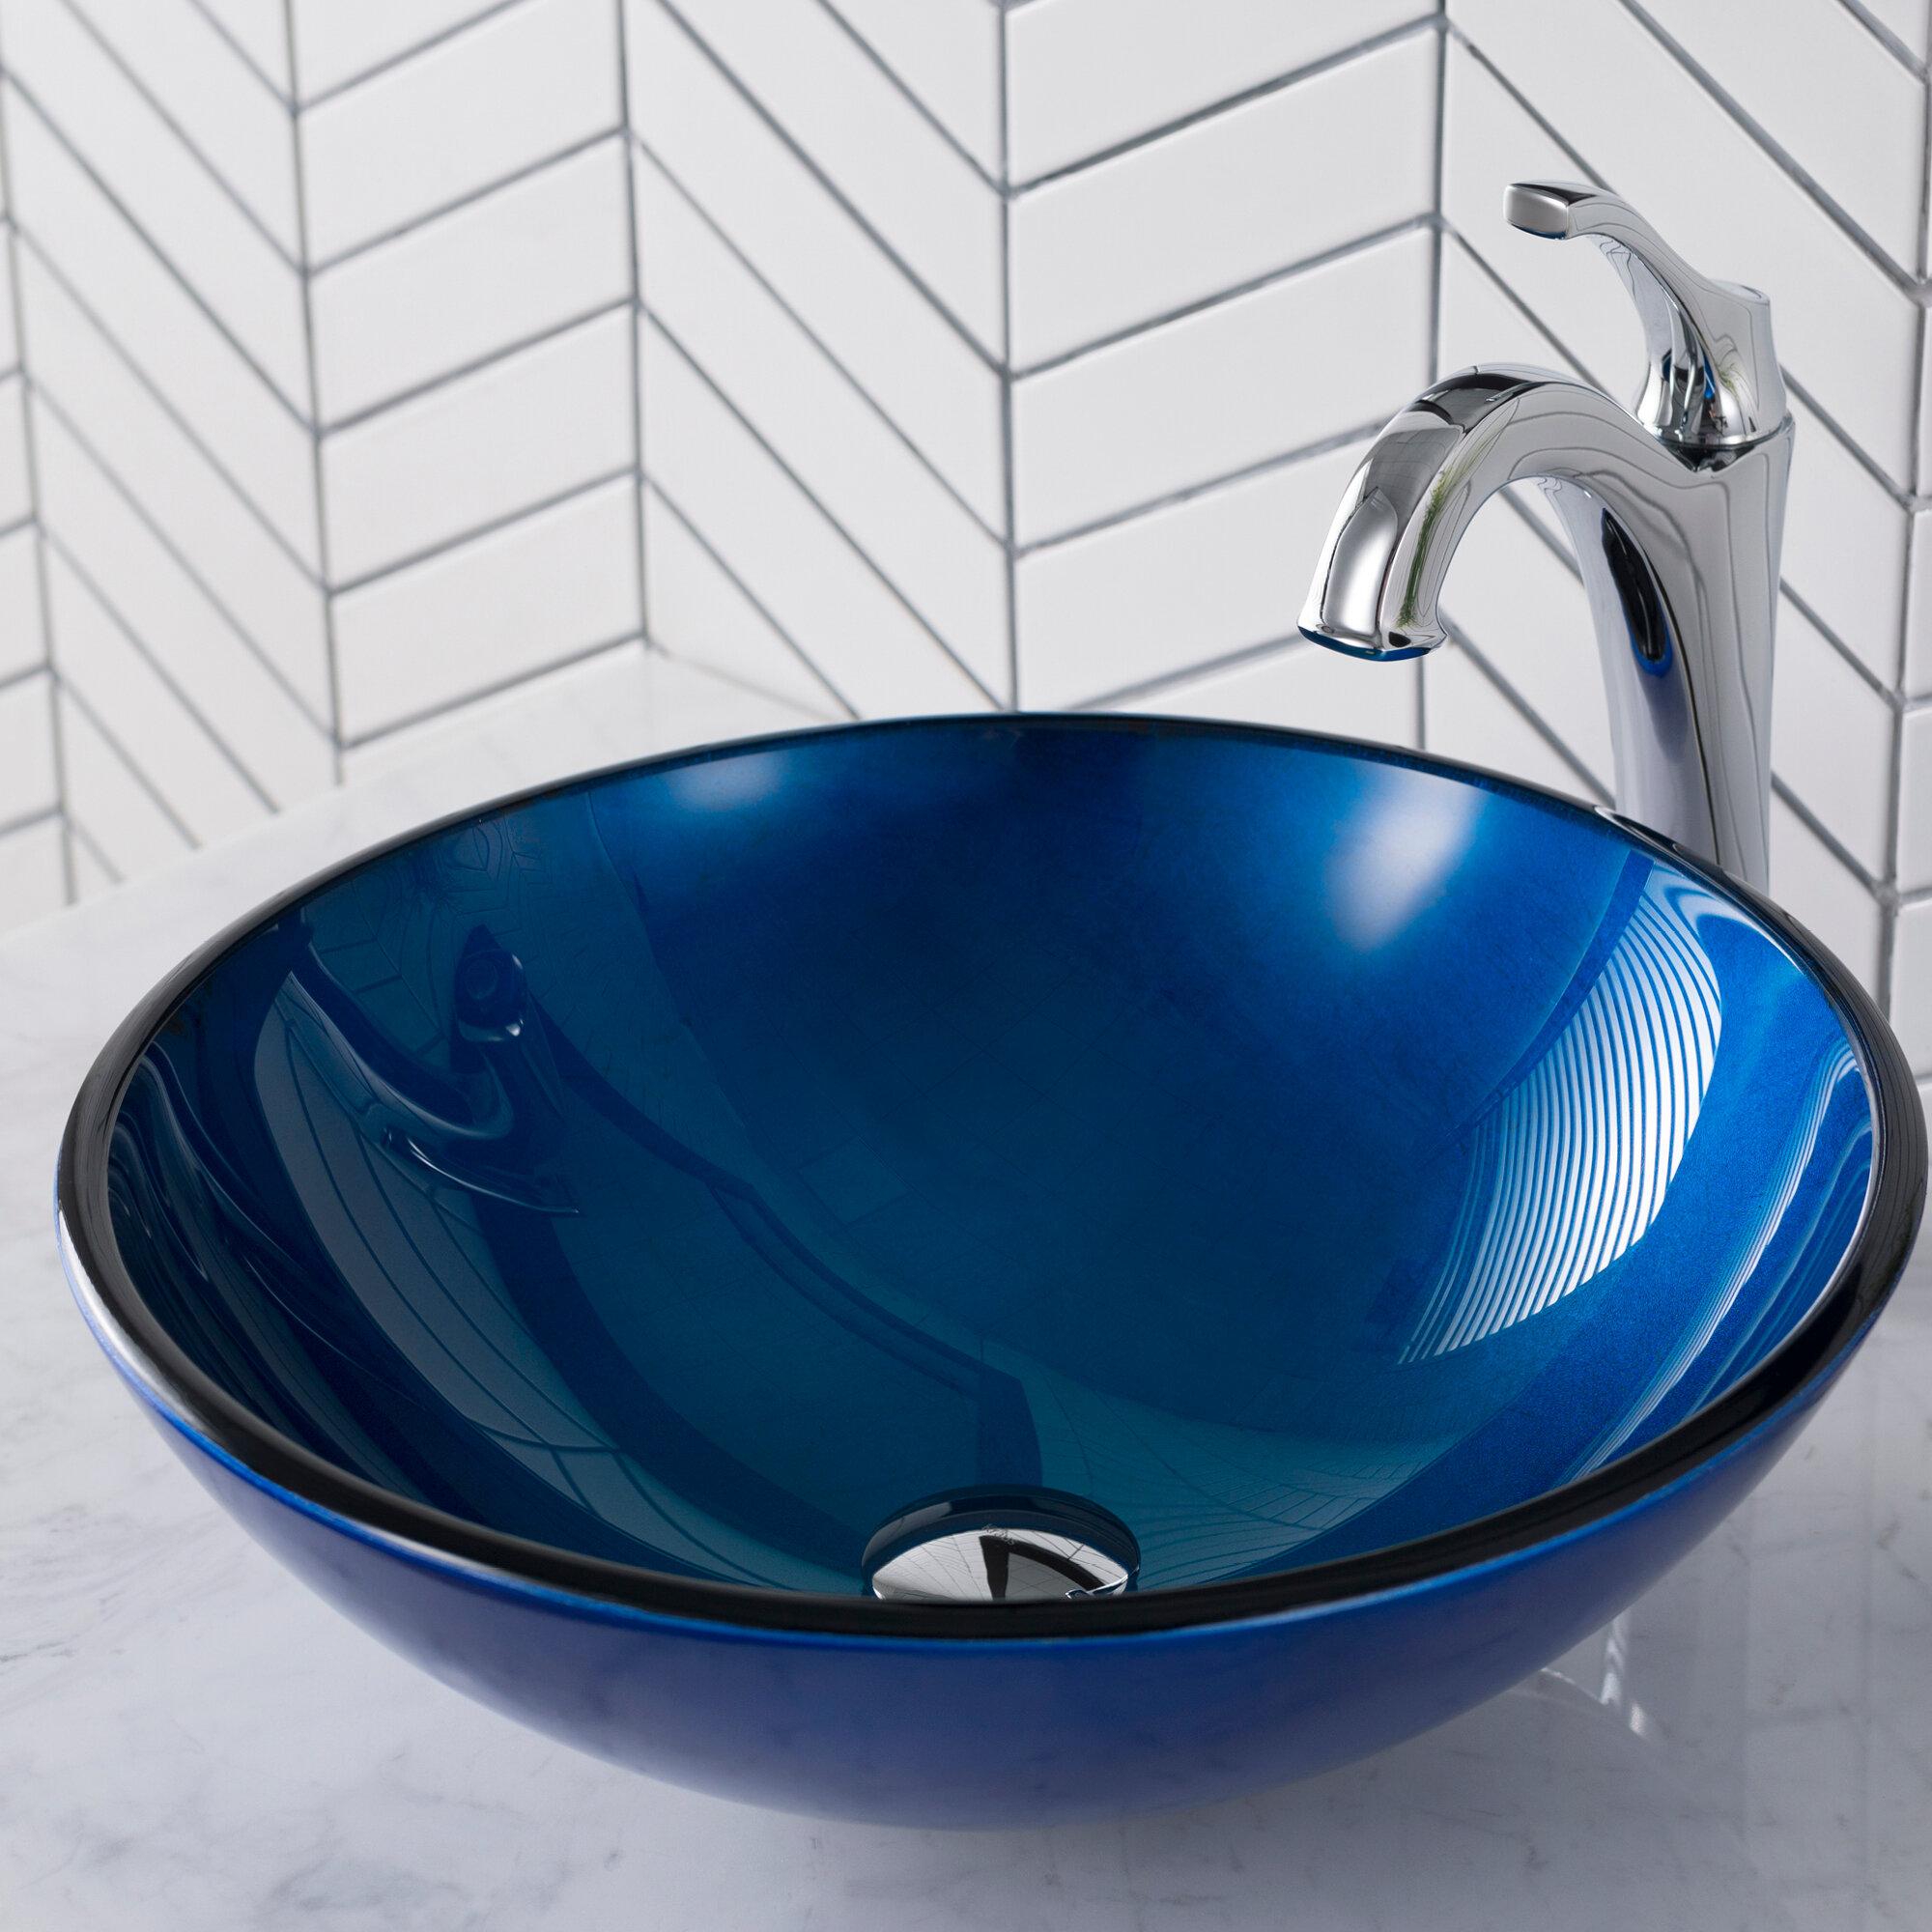 Gv 200 Ch Kraus Galaxy Glass Circular Vessel Bathroom Sink Reviews Wayfair